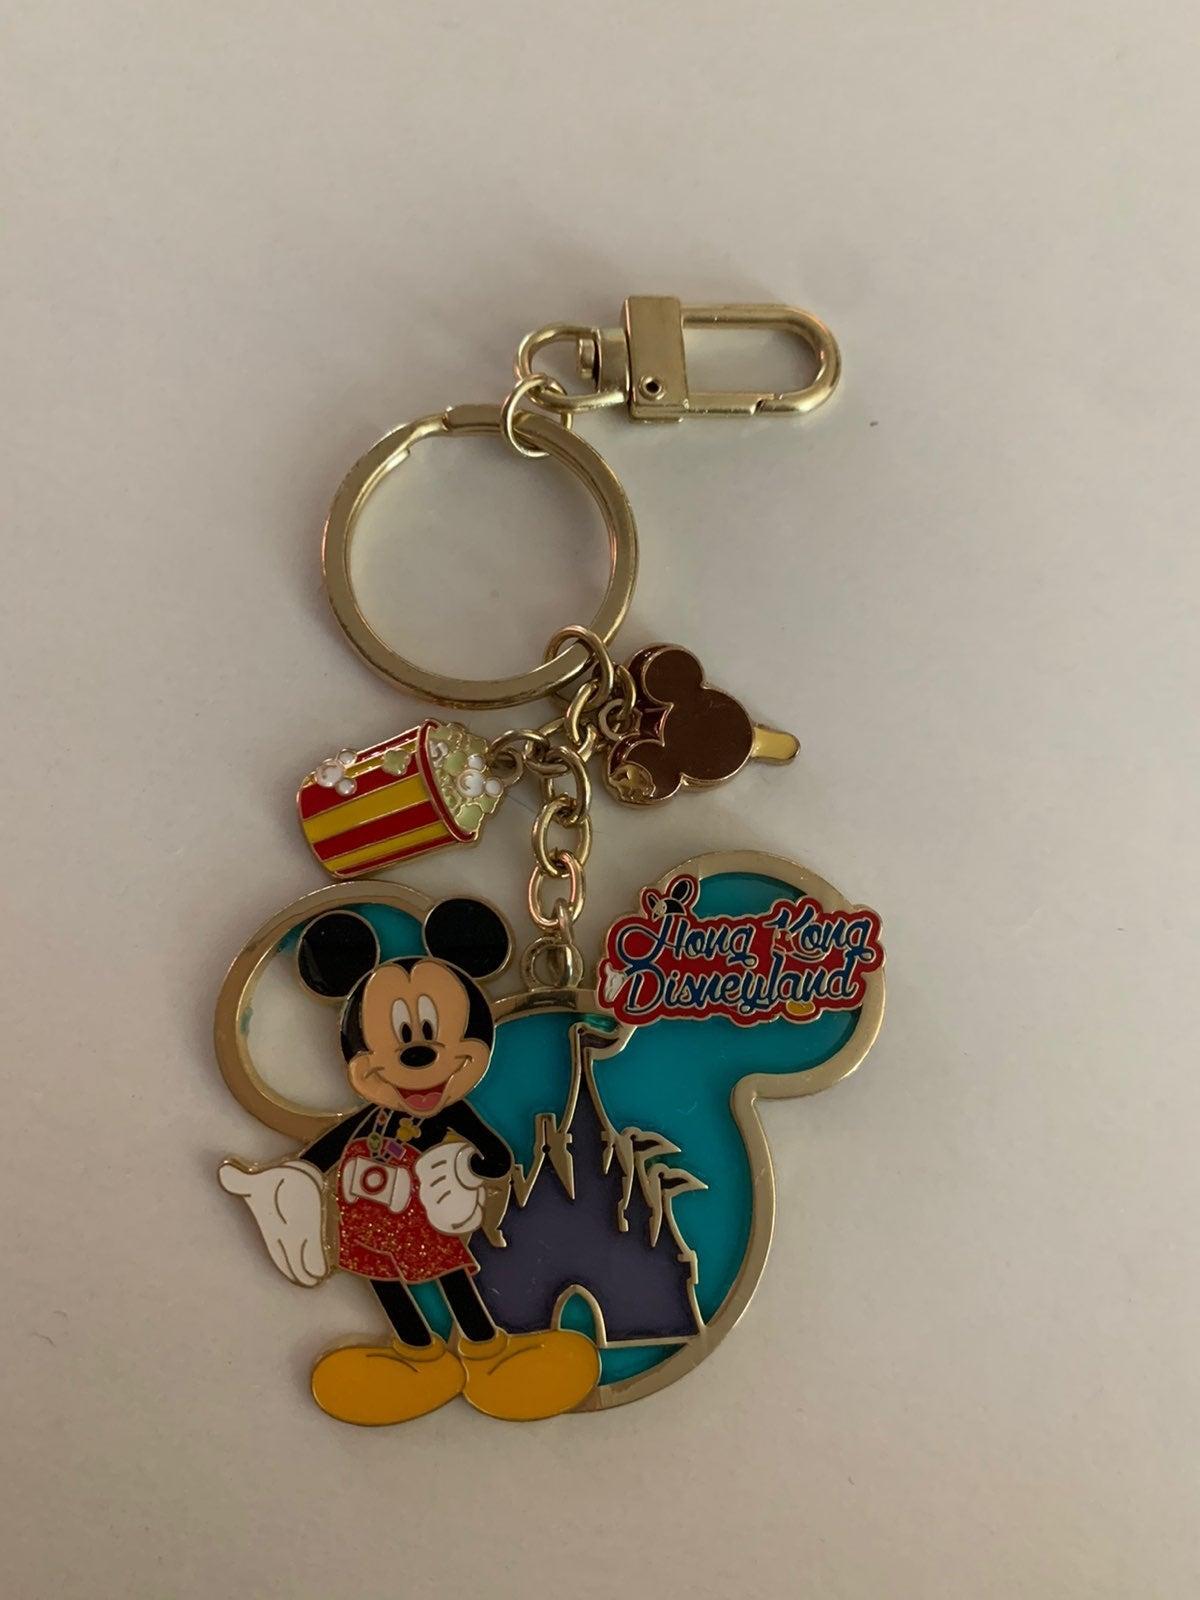 Disneyland Hong Kong Keychain